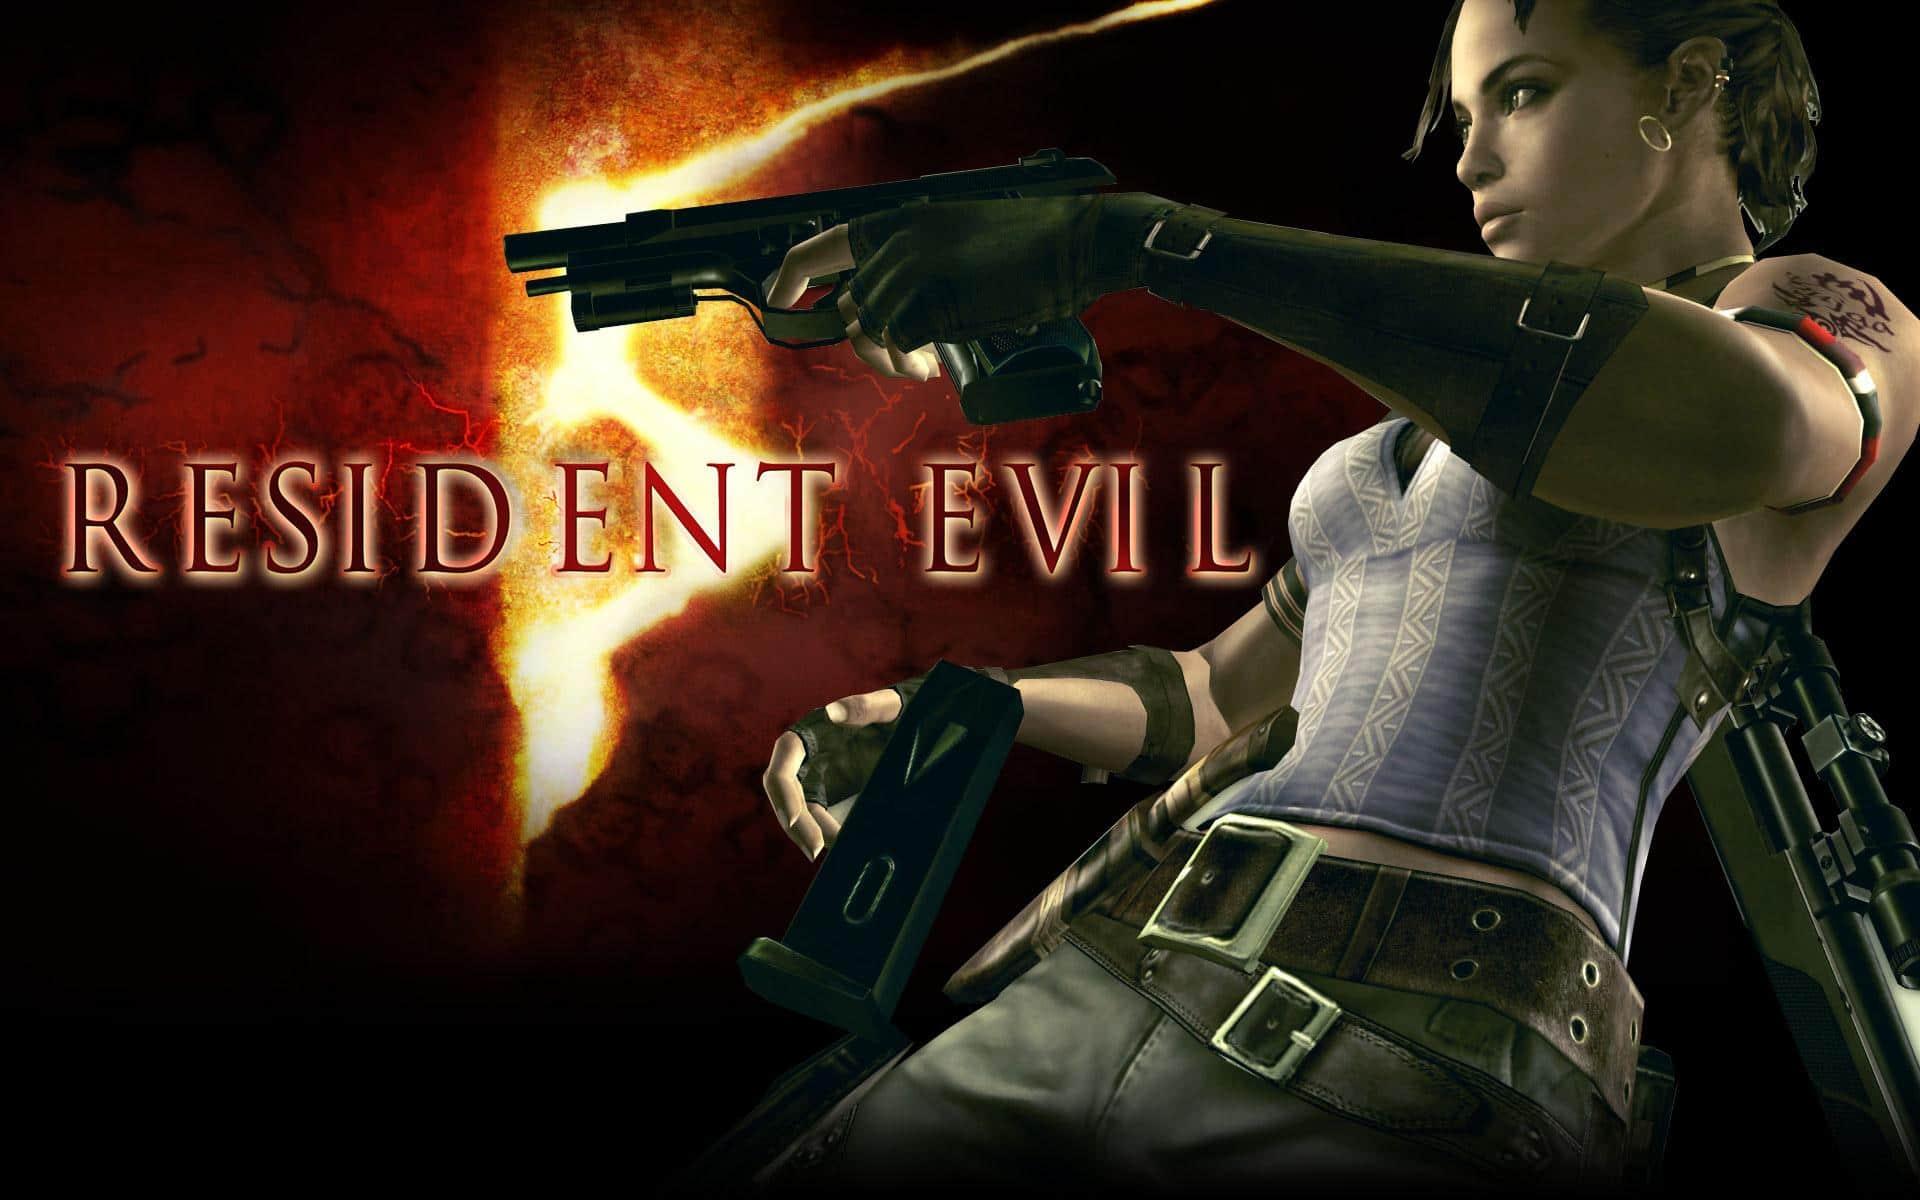 Requisitos para instalar Residen evil 5,